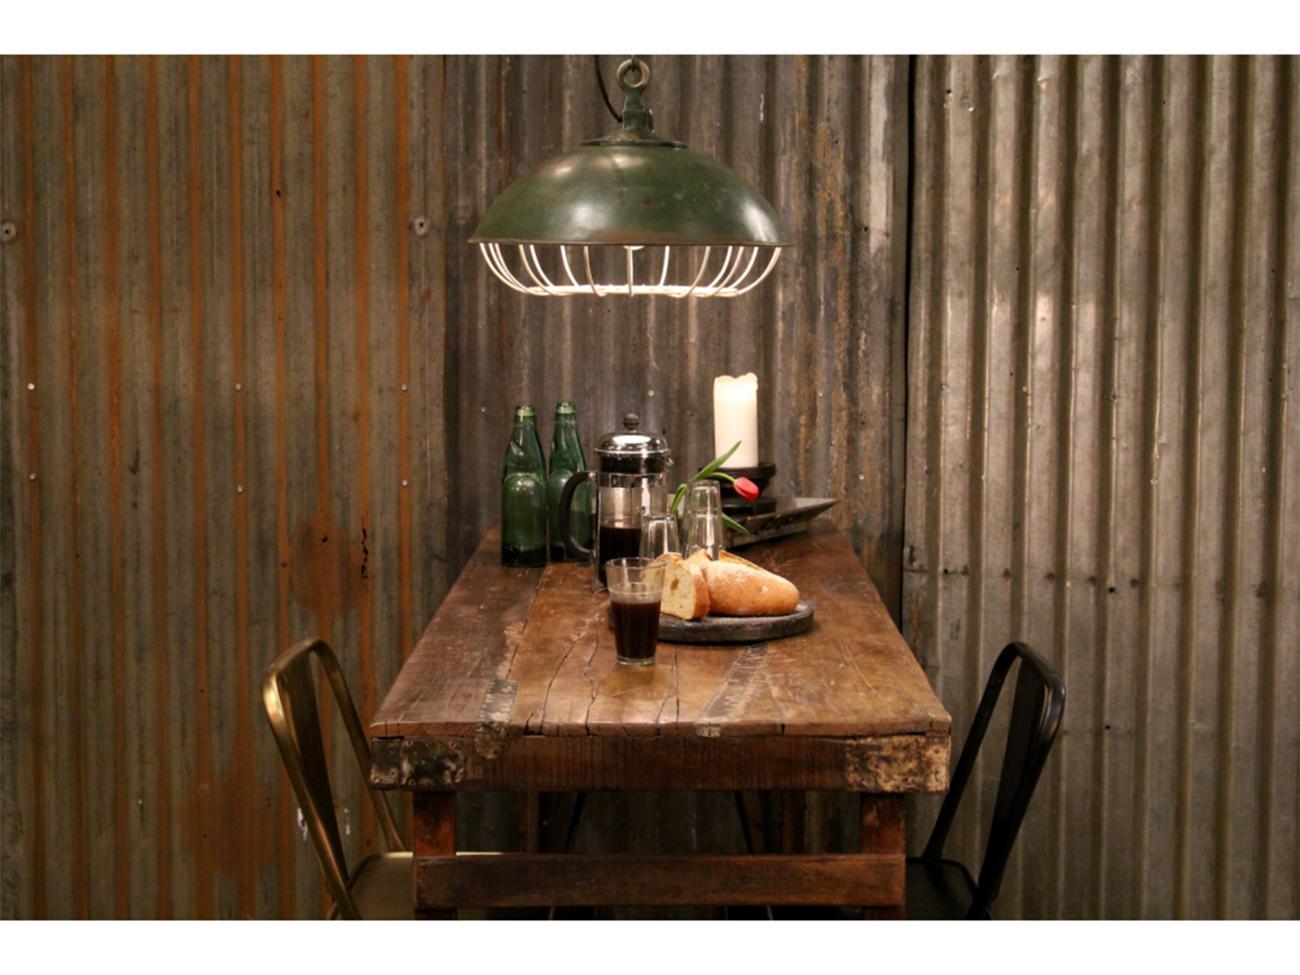 Barstol 'Montmartre' SvartAntik | Reforma Sthlm